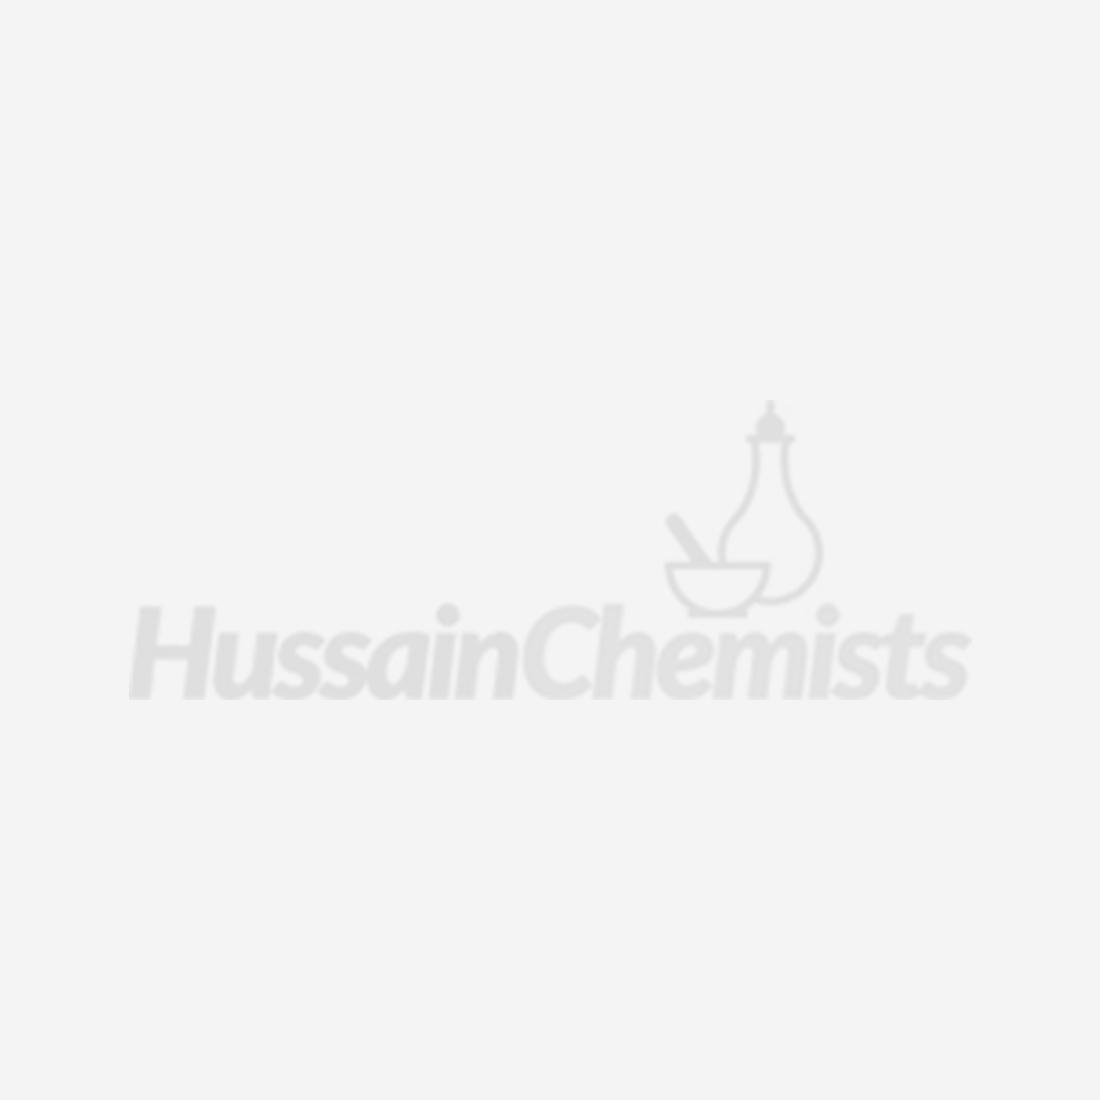 Otrivine® Adult Nasal Drops 10ml